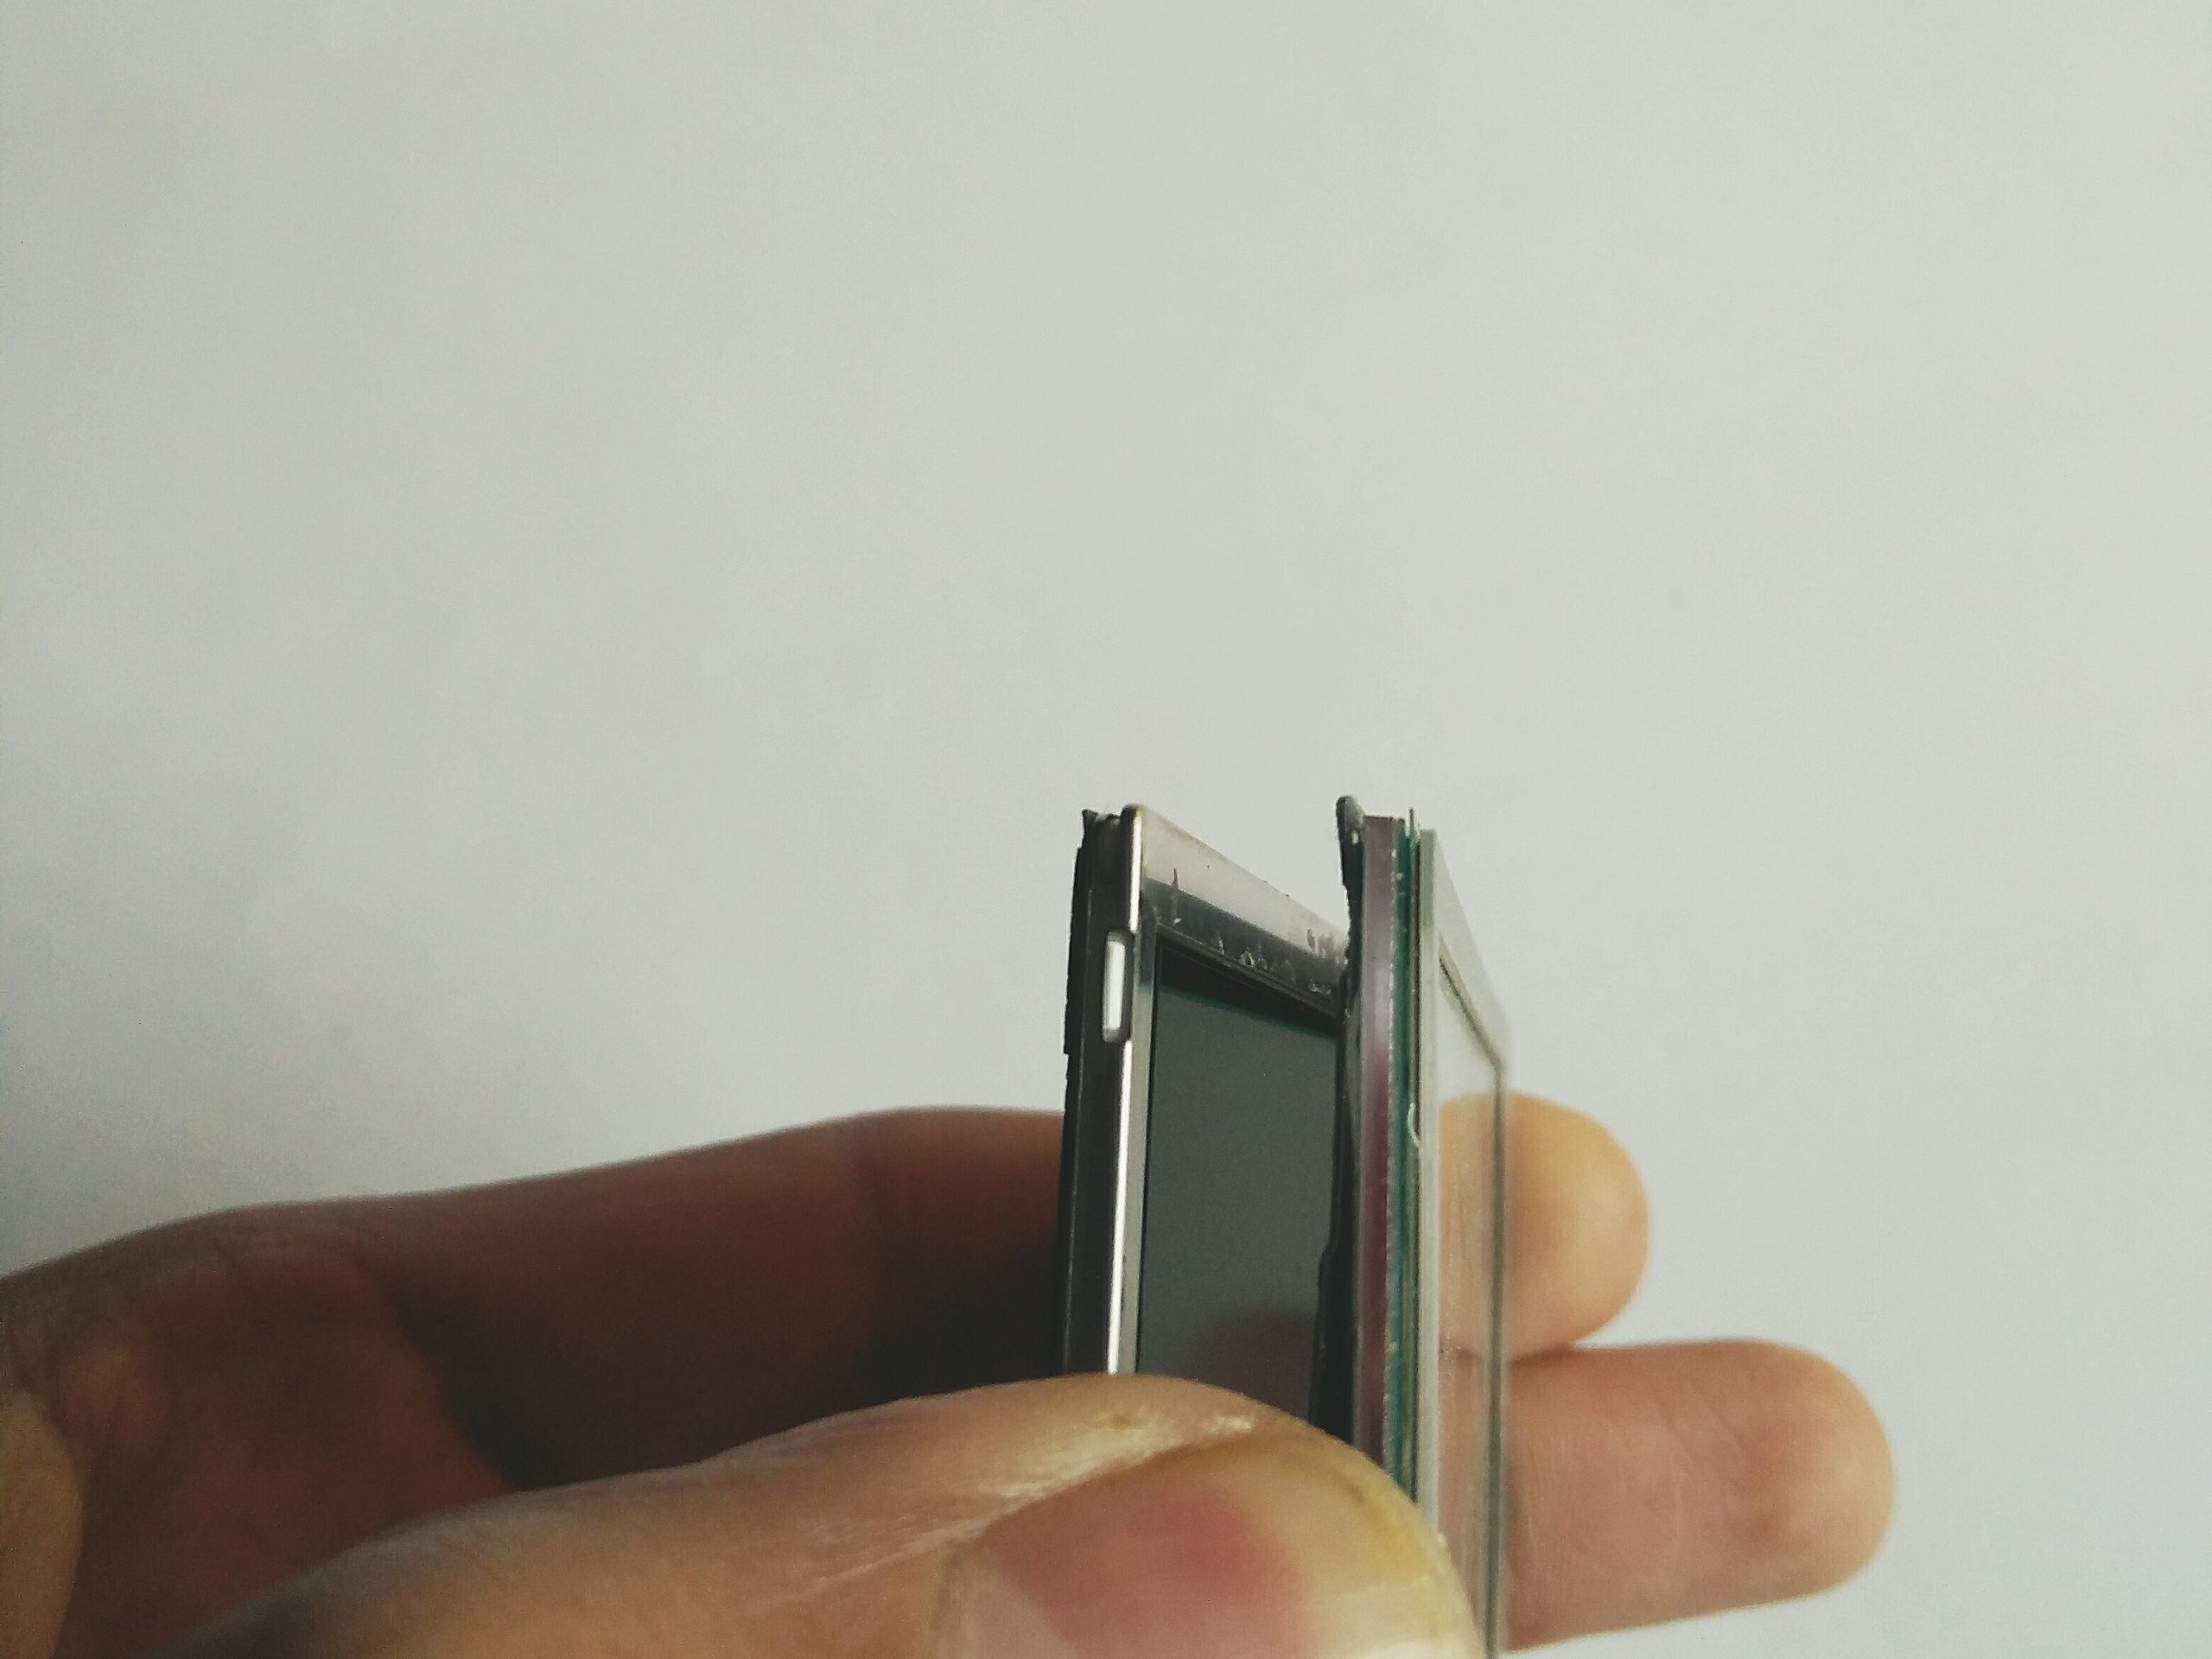 Gameboy Macro Lens Guide